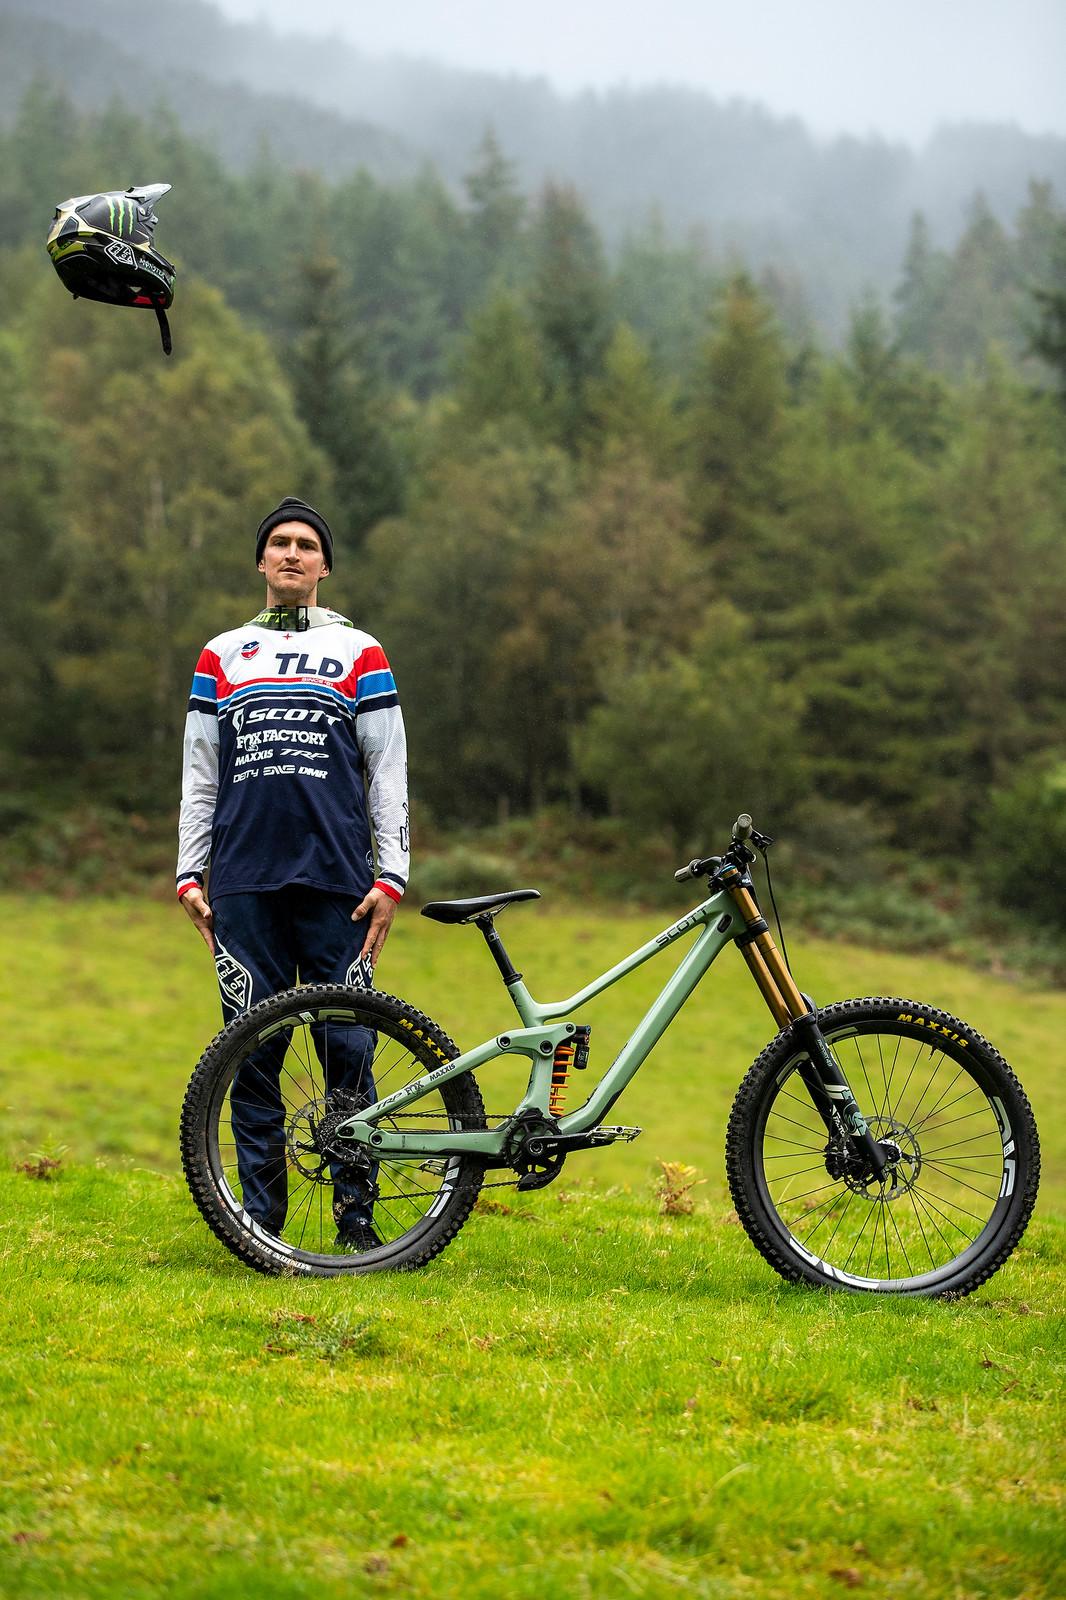 Brendan Fairclough with his Scott Gambler - The Bikes of Red Bull Hardline - Mountain Biking Pictures - Vital MTB